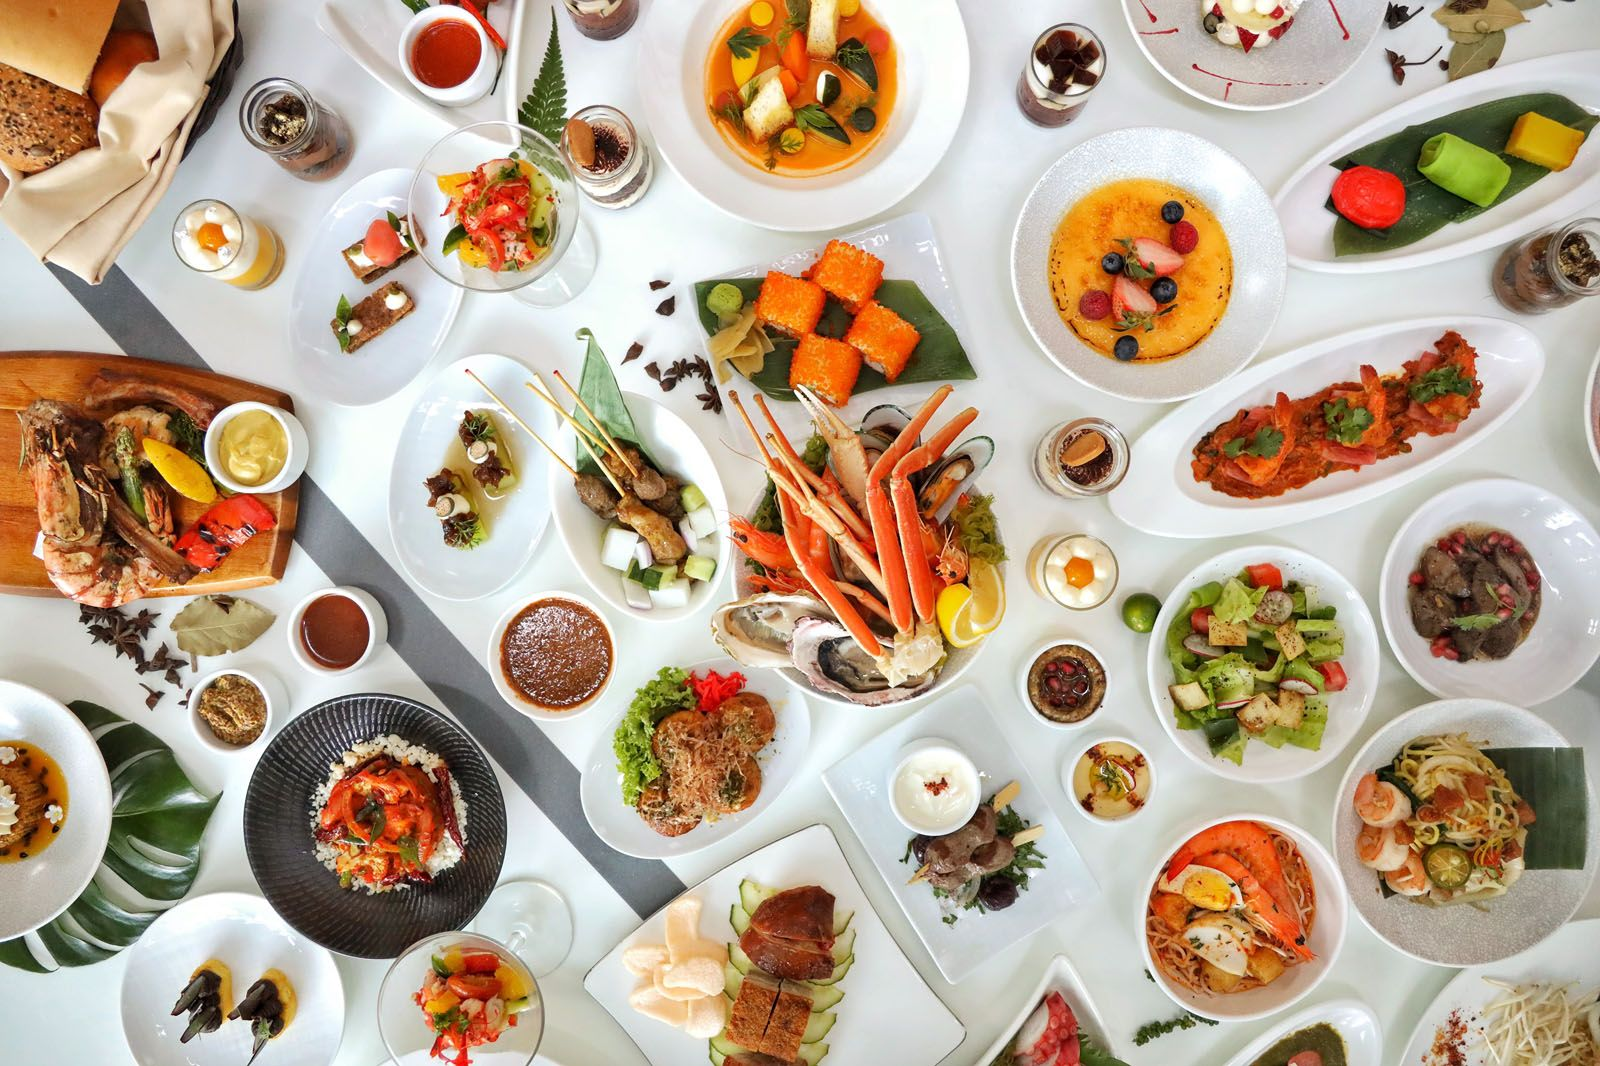 Where to Eat in Singapore This Week: The Line, Akira Back, One-Ninety Restaurant, Shoukouwa, Peach Garden